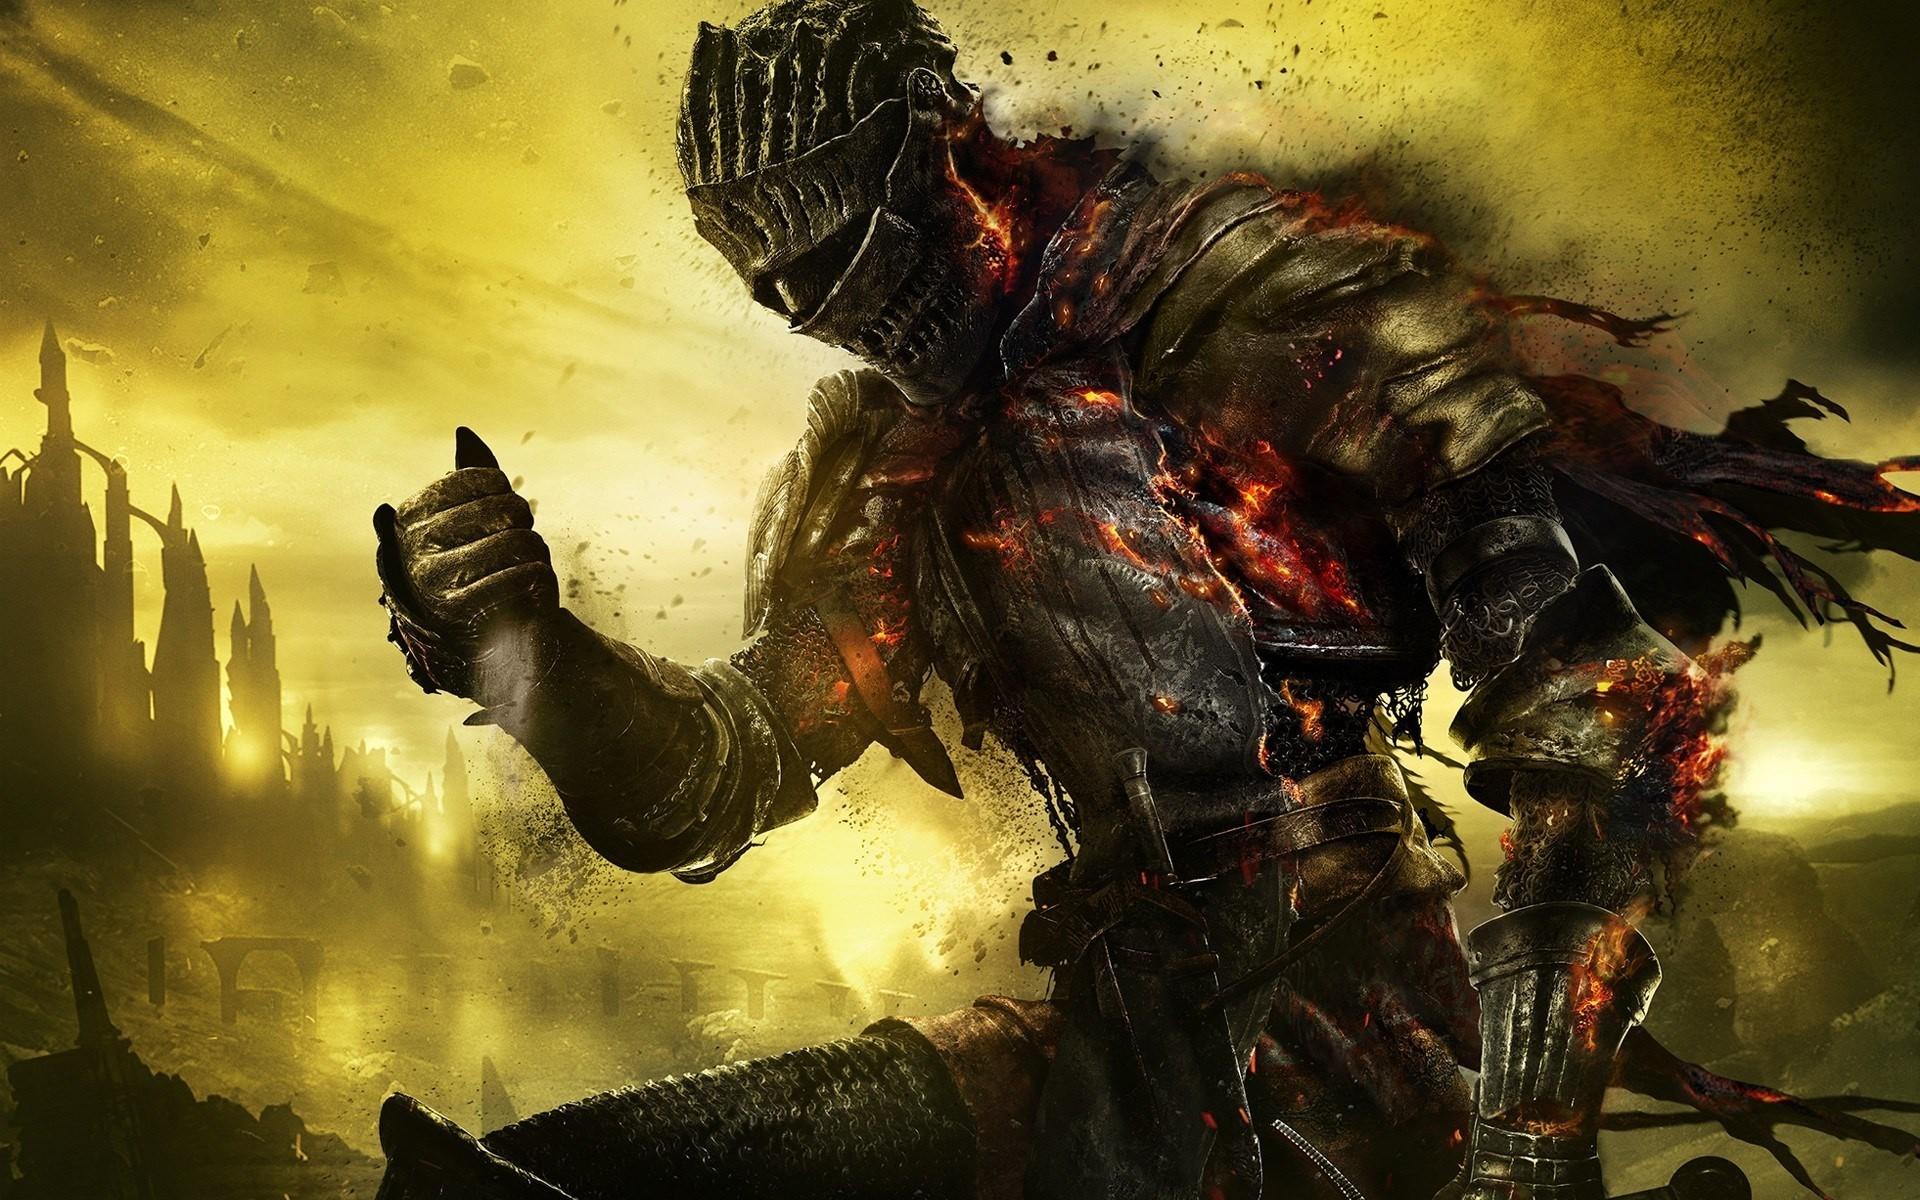 Dark Souls 3 HD Wallpaper (86+ images)